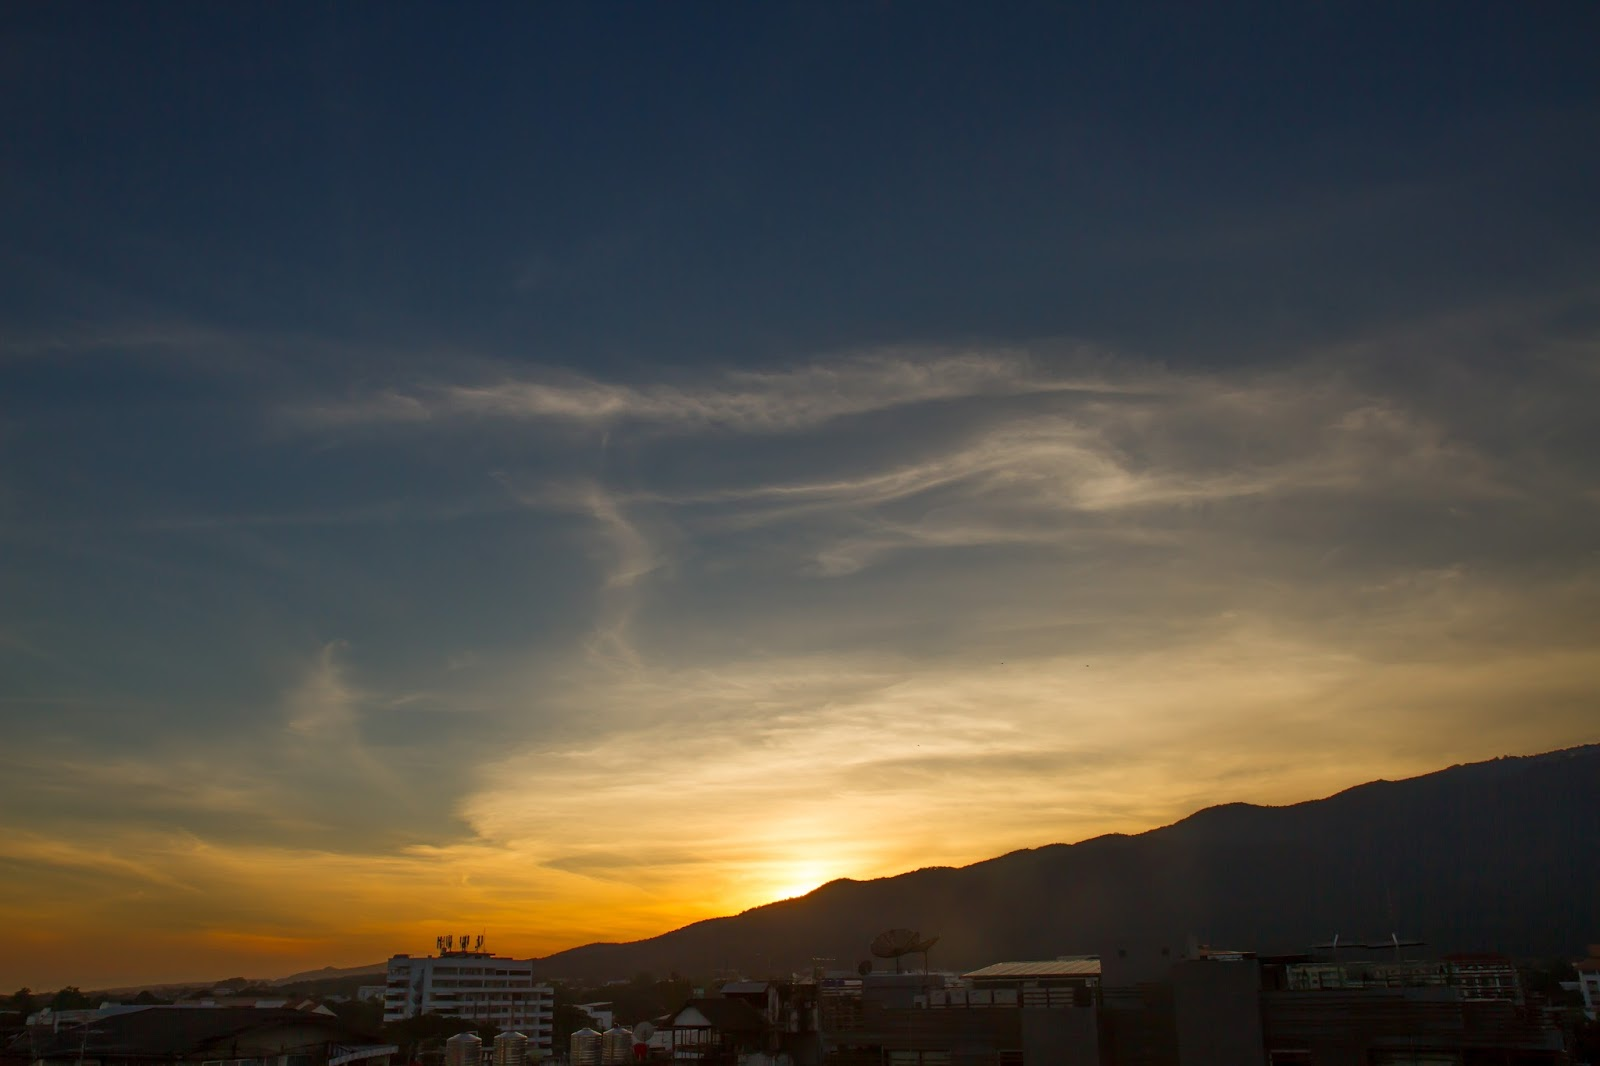 Sunset over Doi Suthep in Chiang Mai Thailand